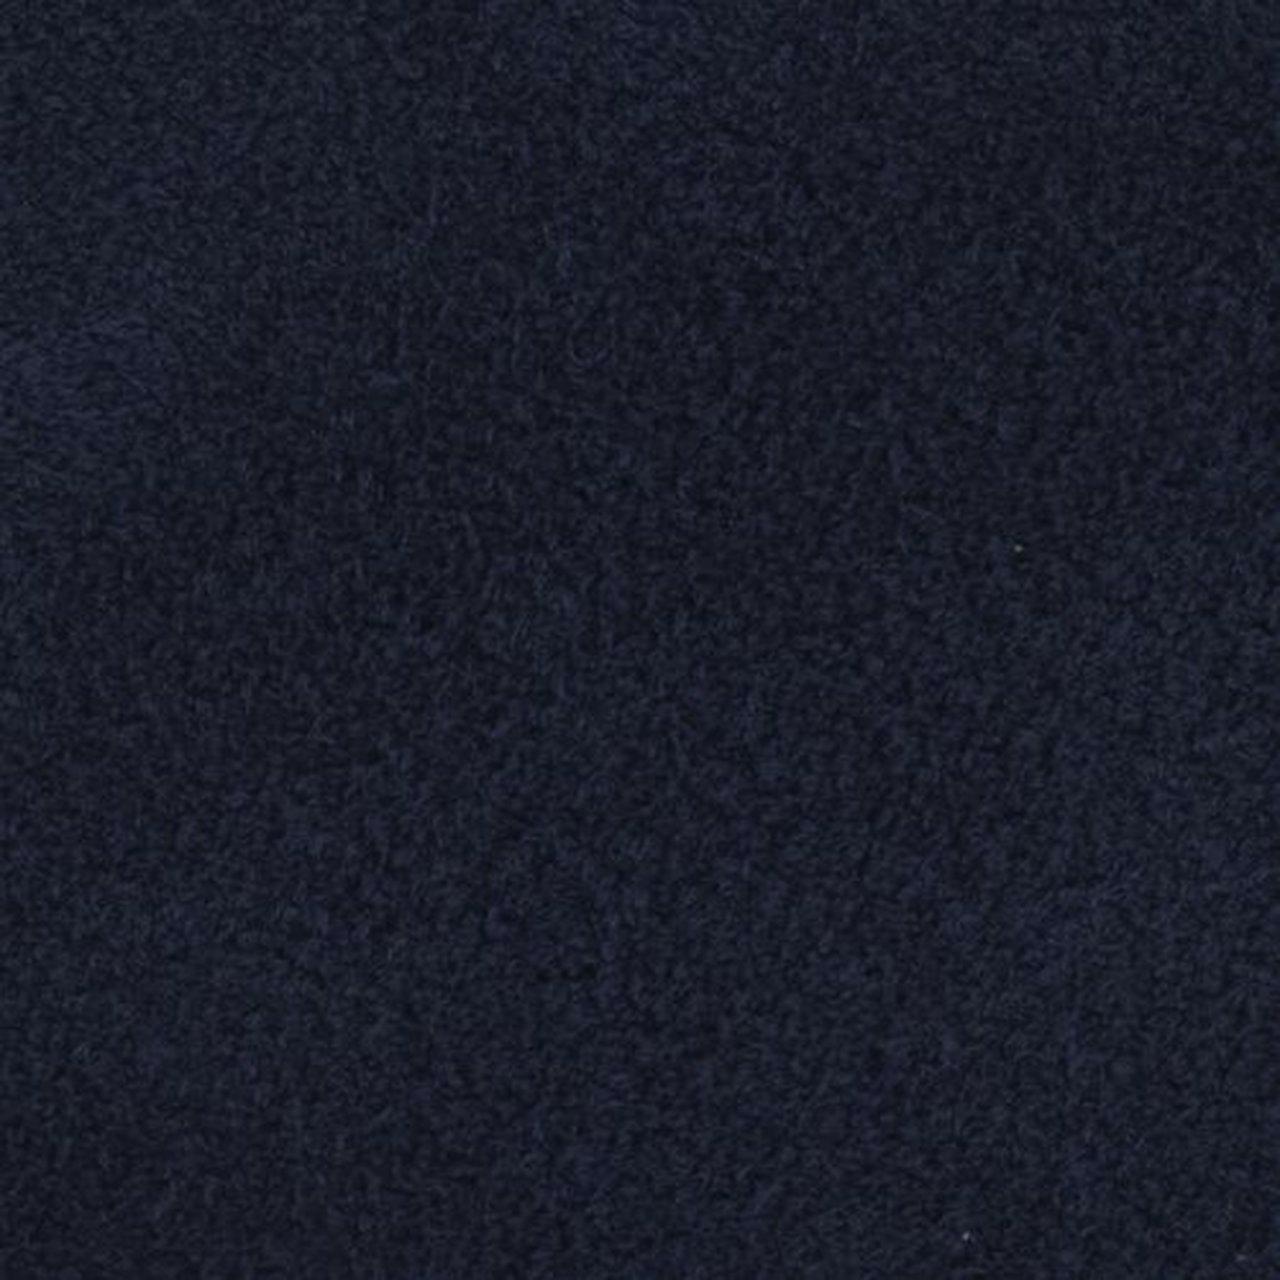 Moda Fireside 60 Polyester Wide Back - True Navy (Min order of 1m)